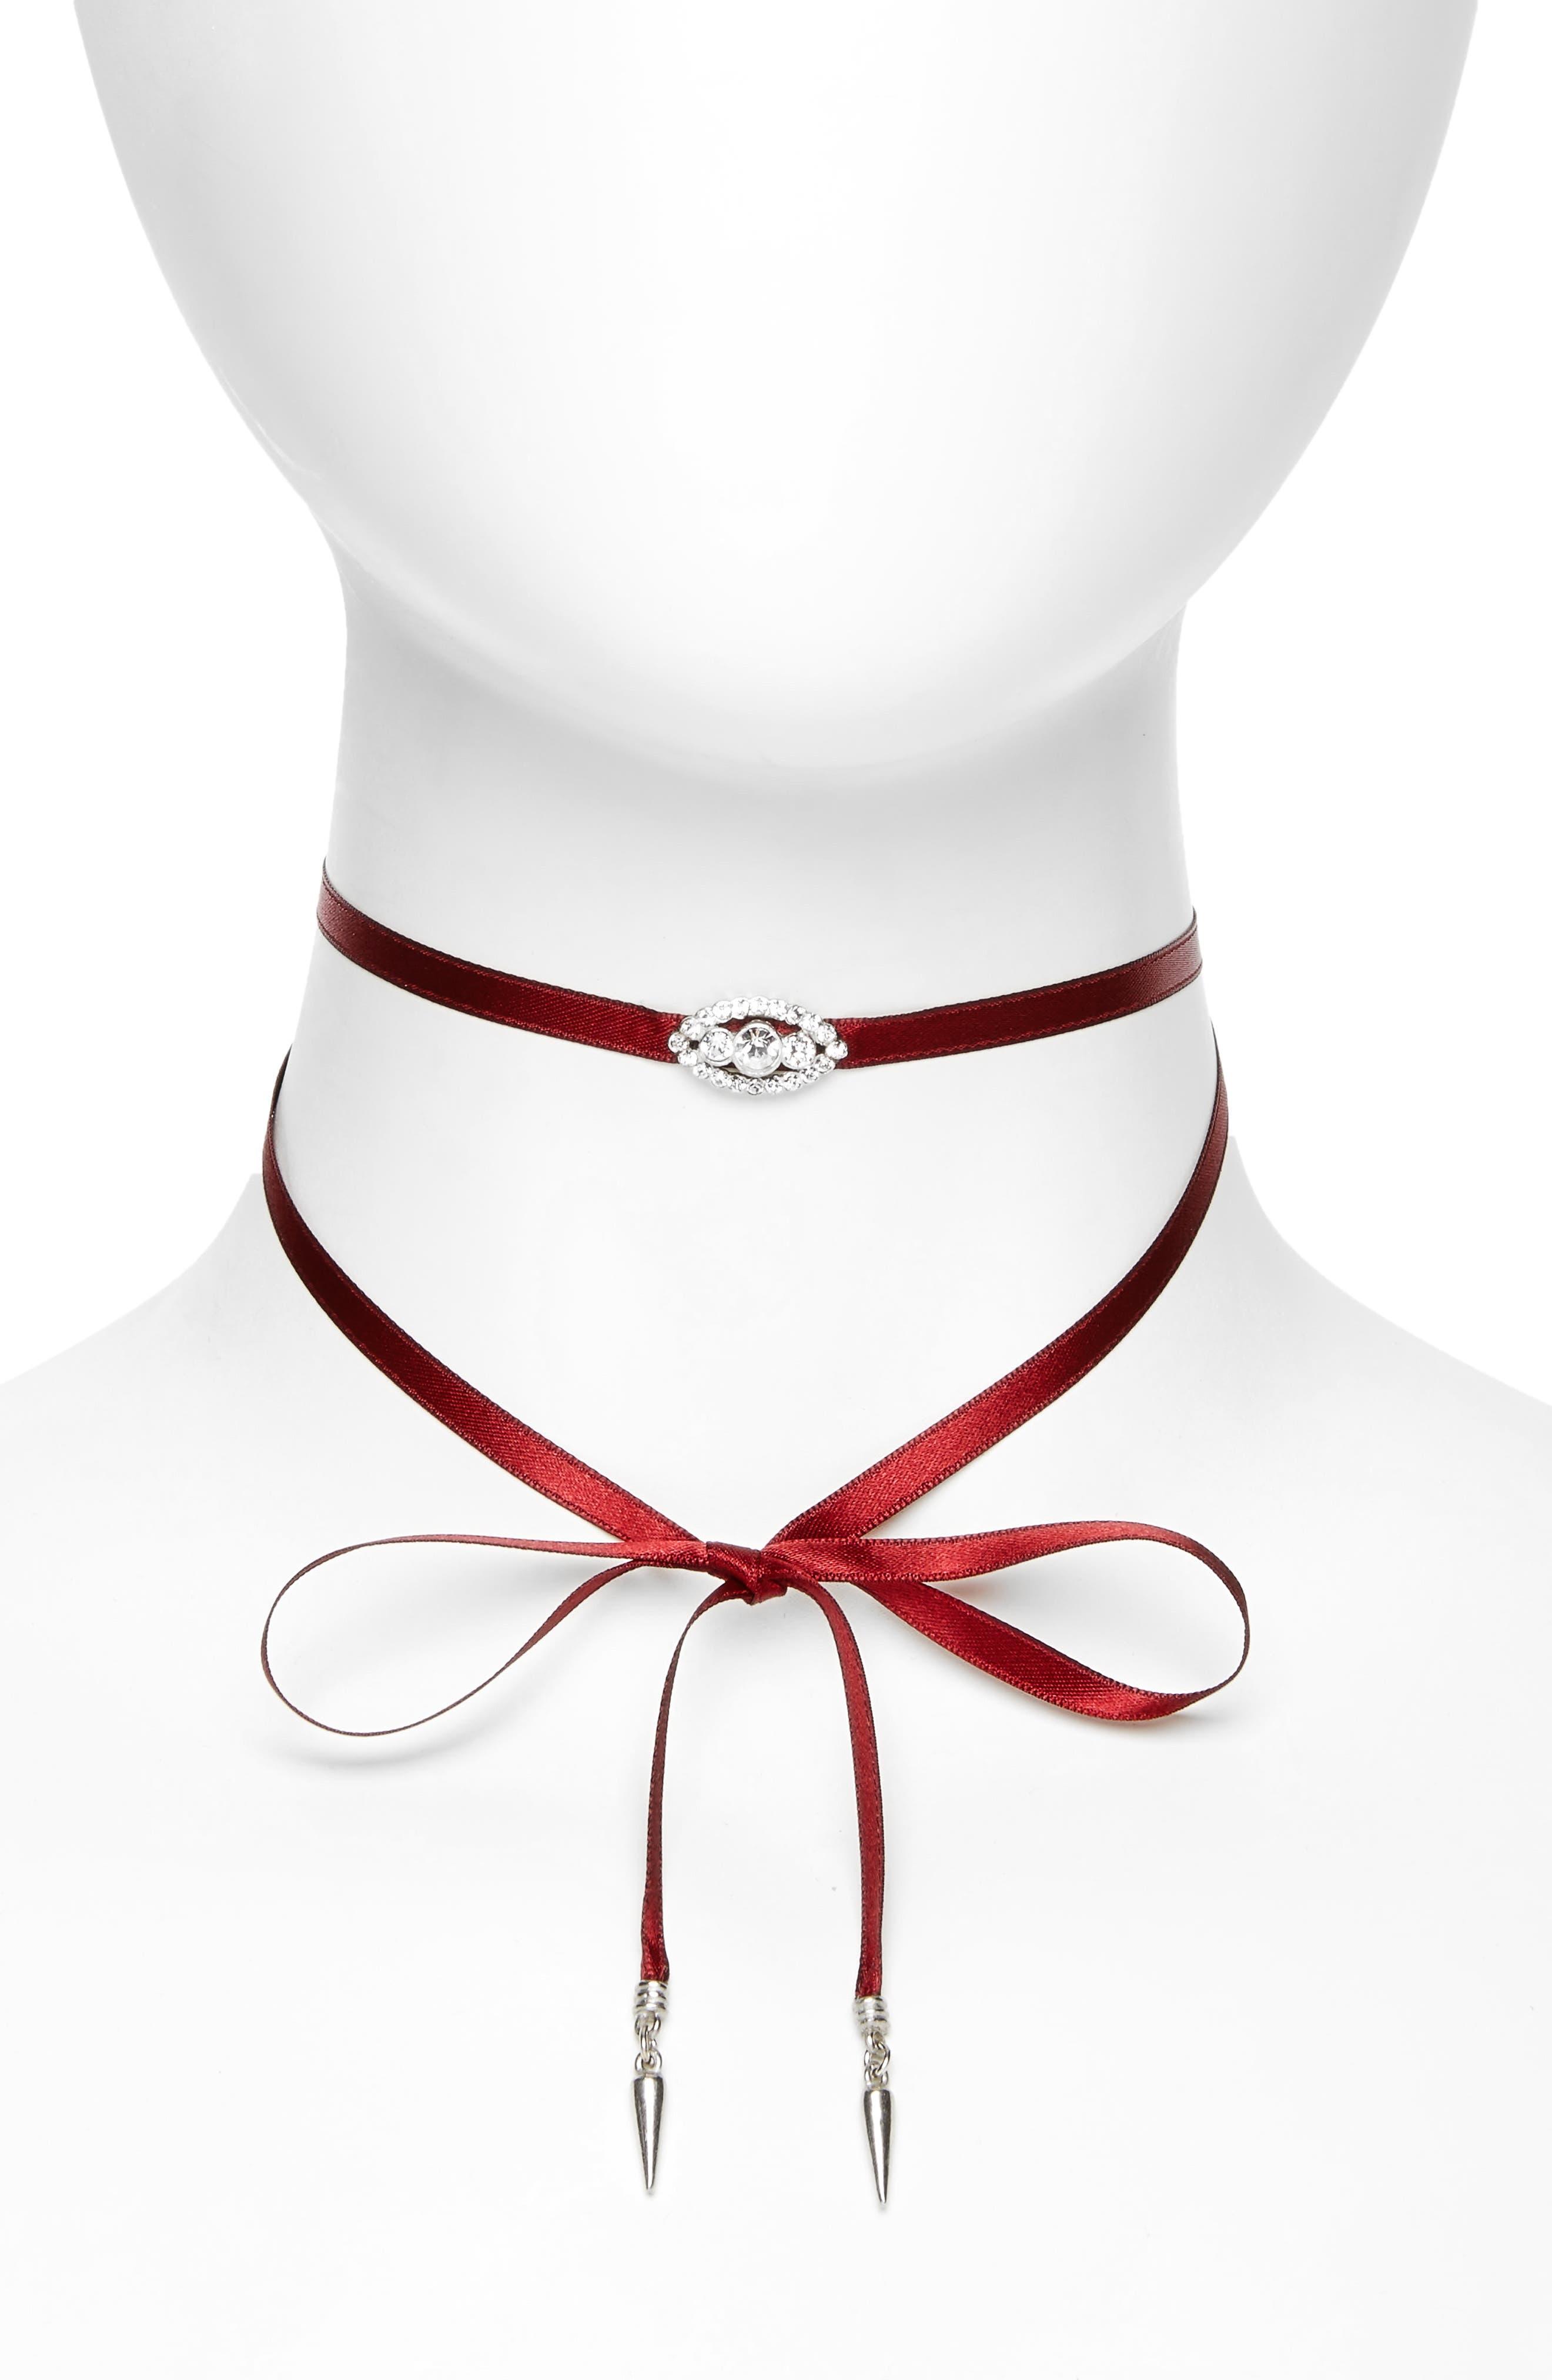 Wrap Choker Necklace,                         Main,                         color, Burgundy / Silver